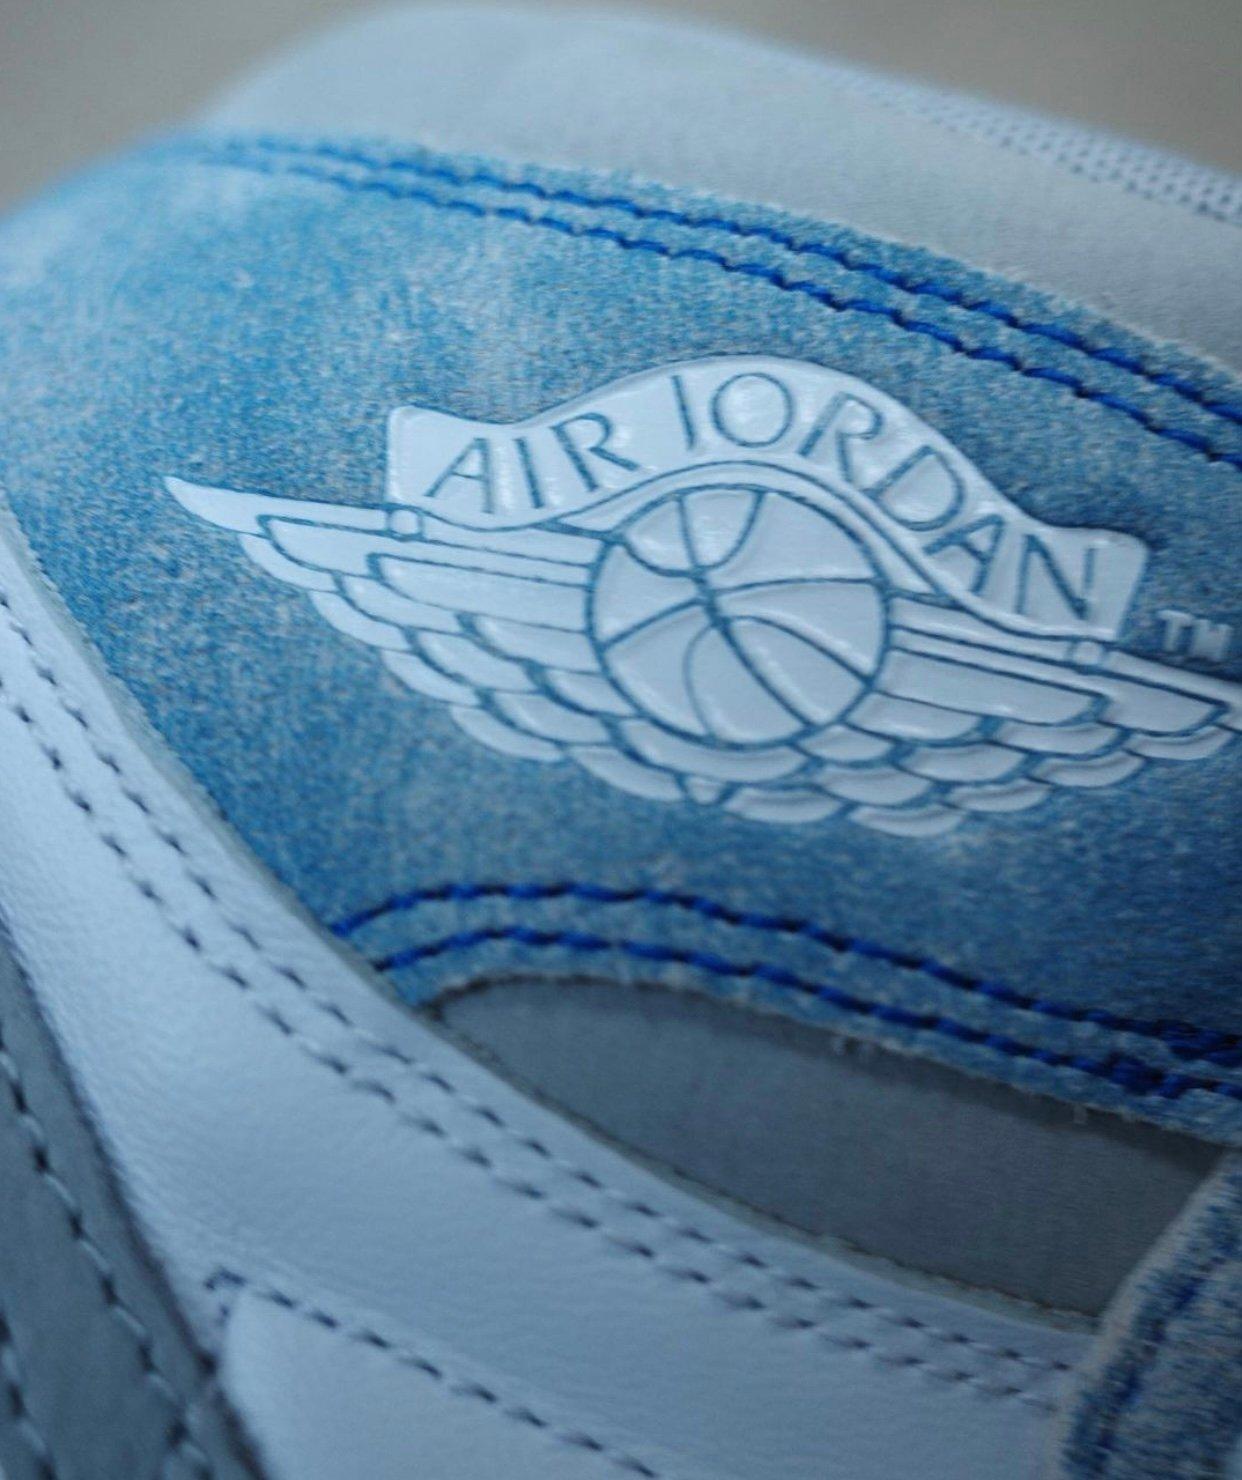 Air Jordan 1 Hyper Royal 555088-402 2021 Release